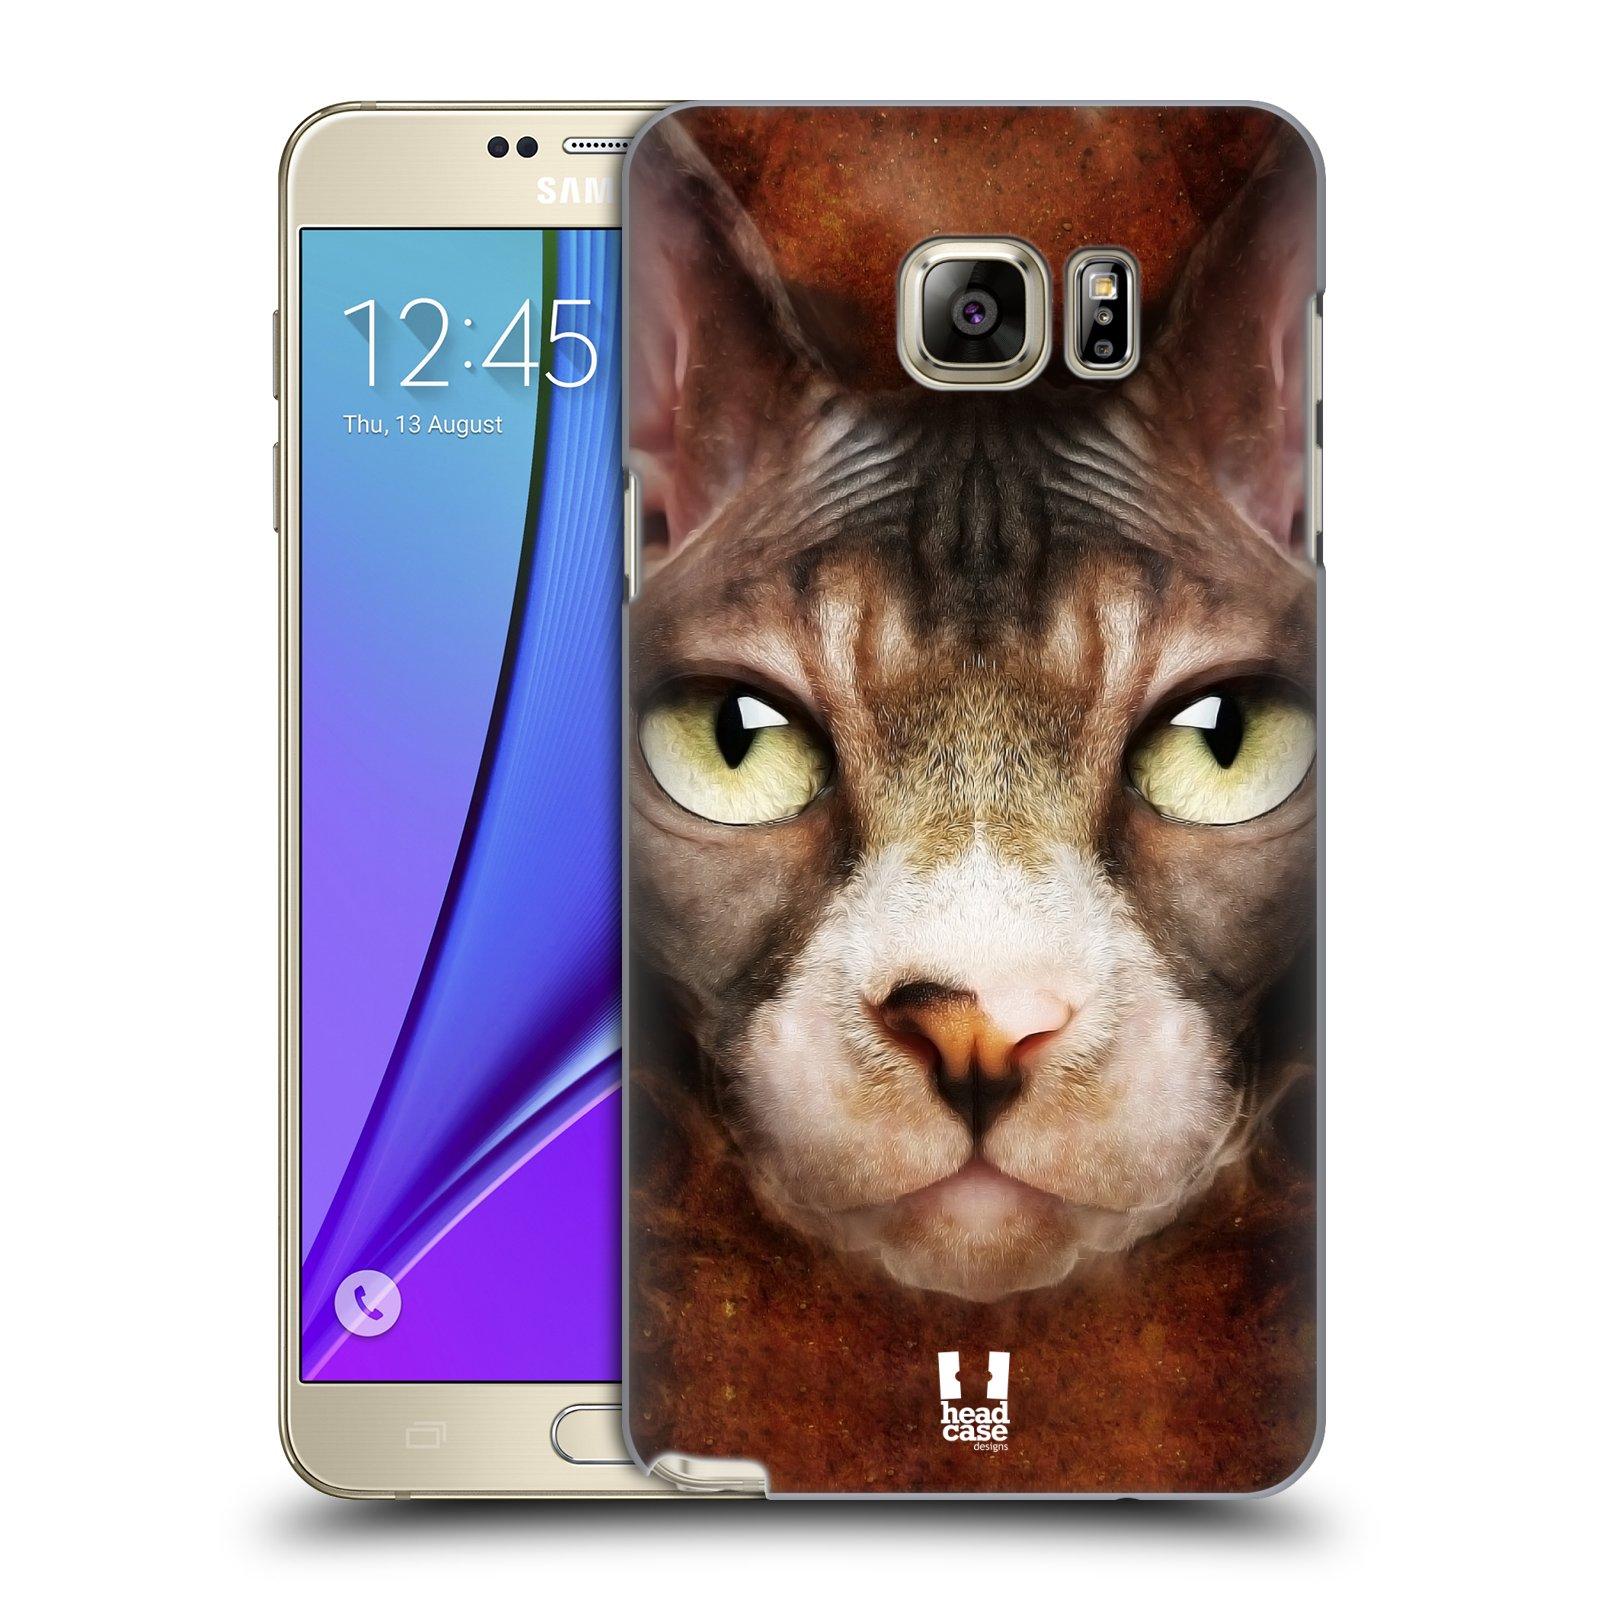 HEAD CASE plastový obal na mobil SAMSUNG Galaxy Note 5 (N920) vzor Zvířecí tváře kočka sphynx